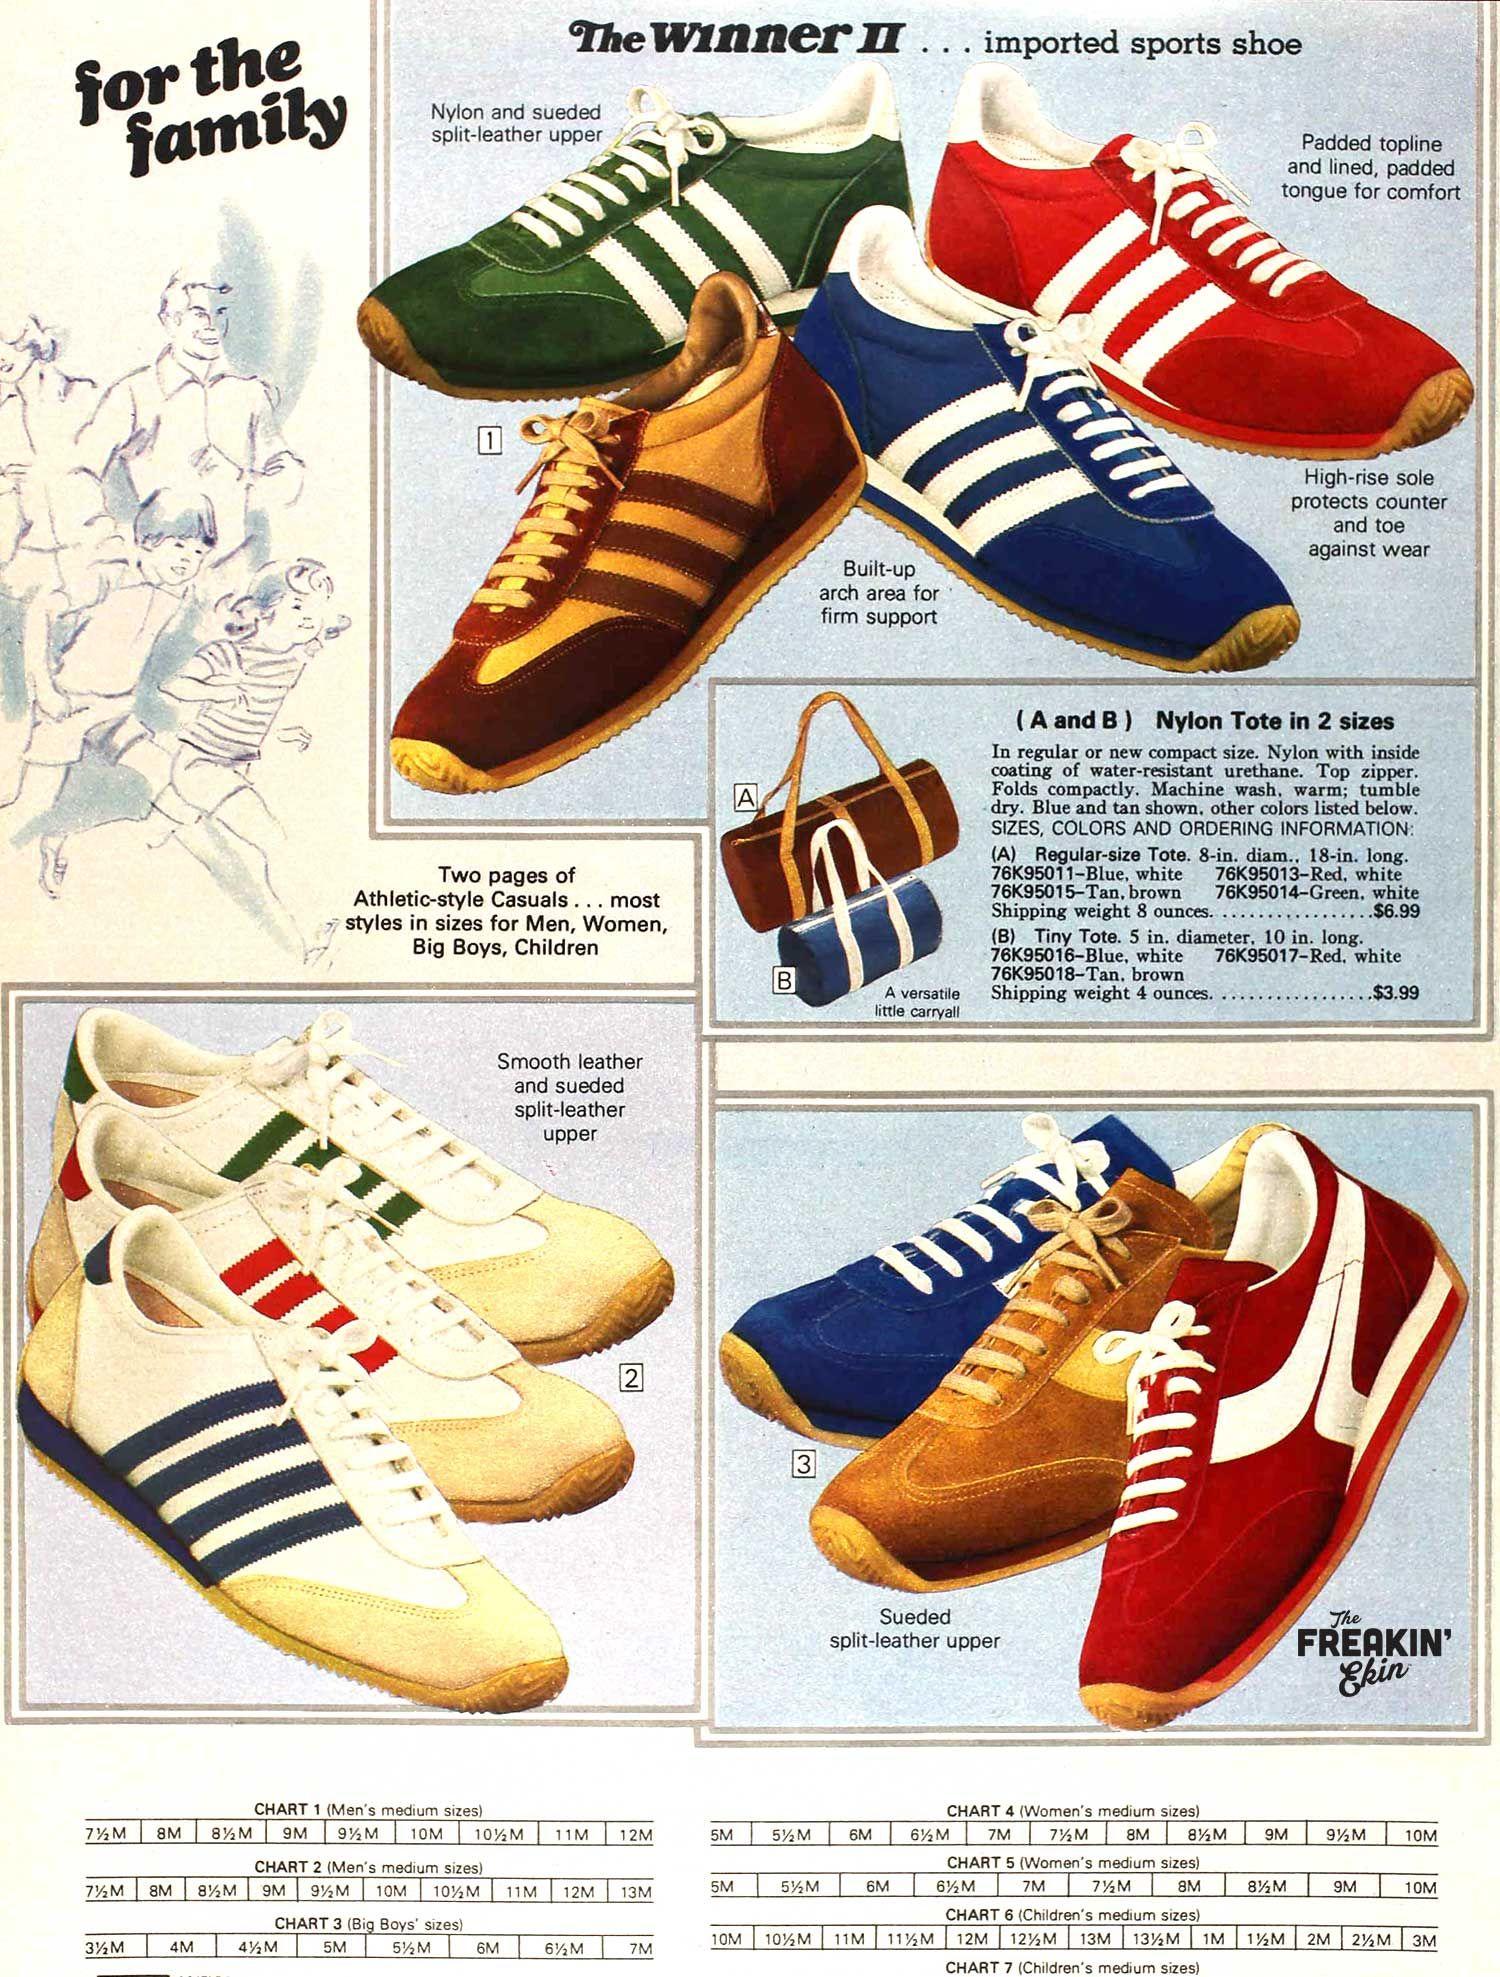 sears adidas shoes Shop Clothing